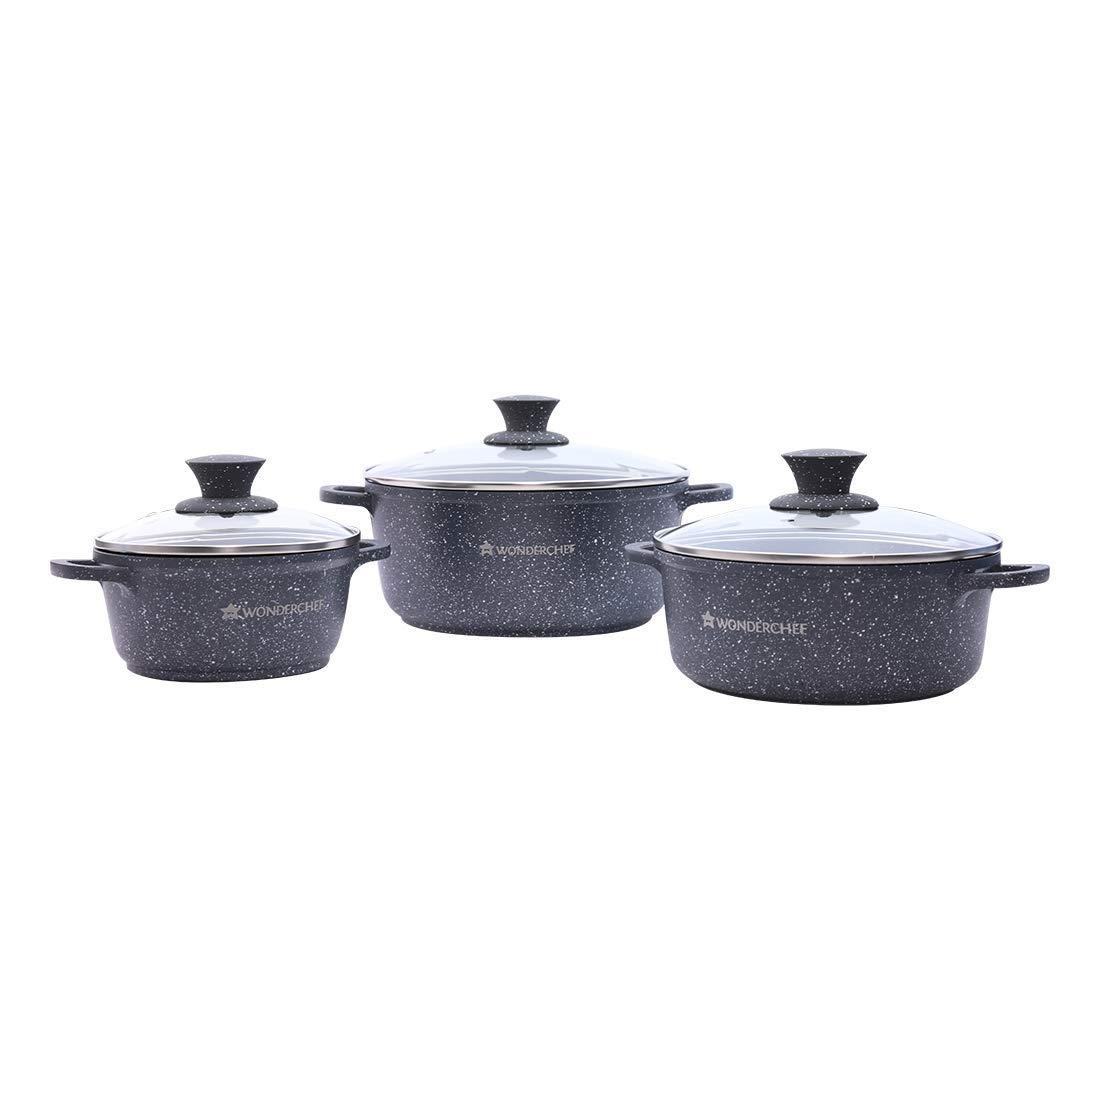 Granite Non-Stick 6-Piece Casserole Set with Lids, Induction Bottom, Soft-Touch Handles, Virgin Grade Aluminium, PFOA/Heavy Metals Free, 3.5mm, 2 Years Warranty, Grey